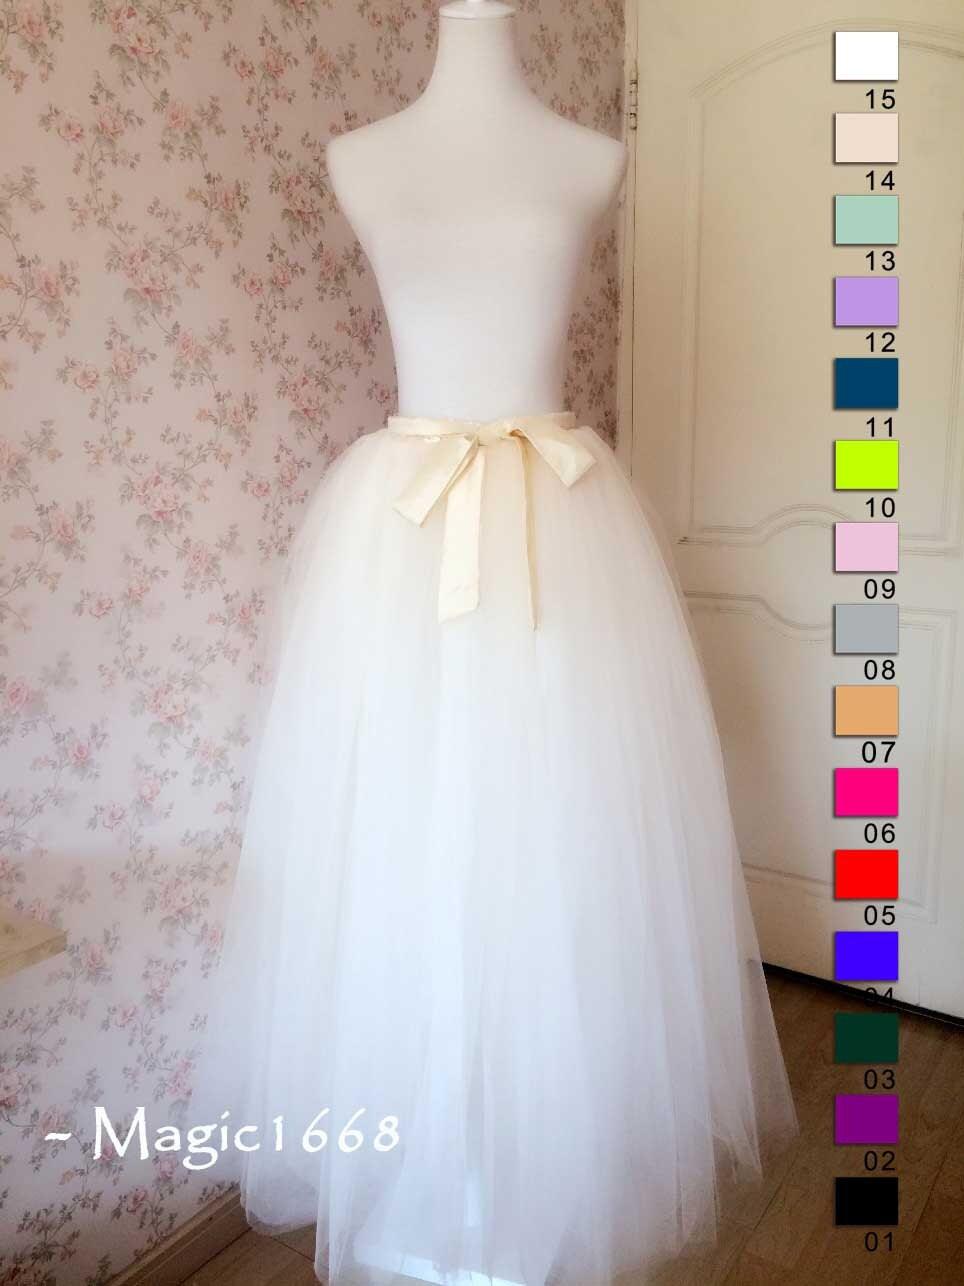 6daec7b67a White Cream Tulle Tutu Skirt Adult 5 7 layer Maxi Tutu Skirt Girls Floor  length Party Tutus Plus Size Custom made Tutu – magic1668 design